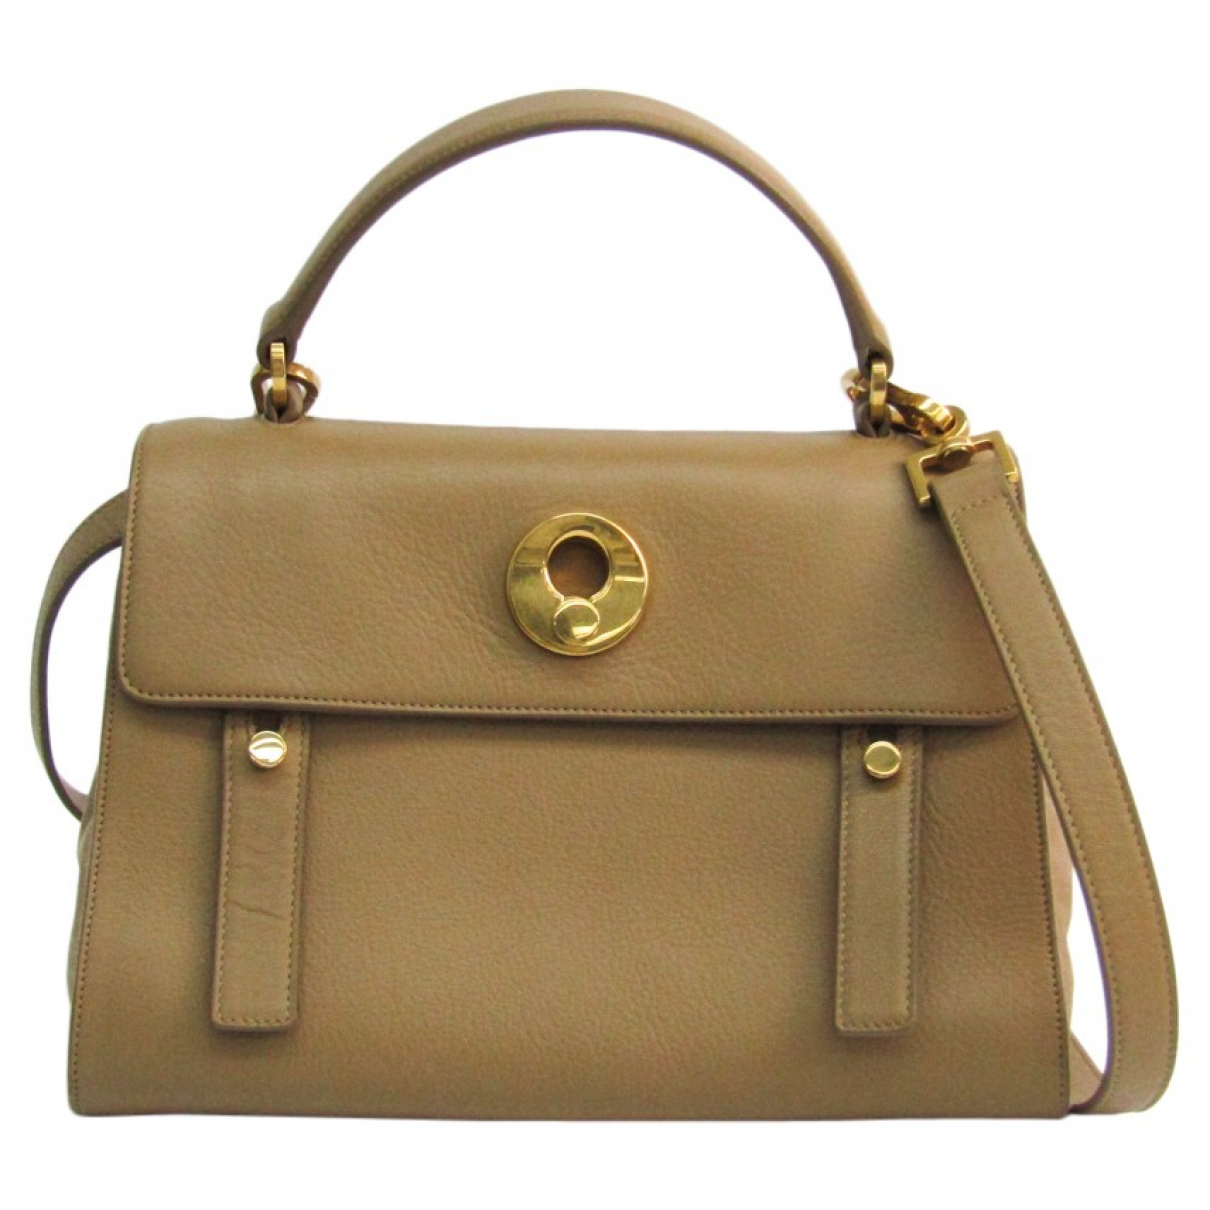 Saint Laurent Muse II Beige Leather handbag for Women \N